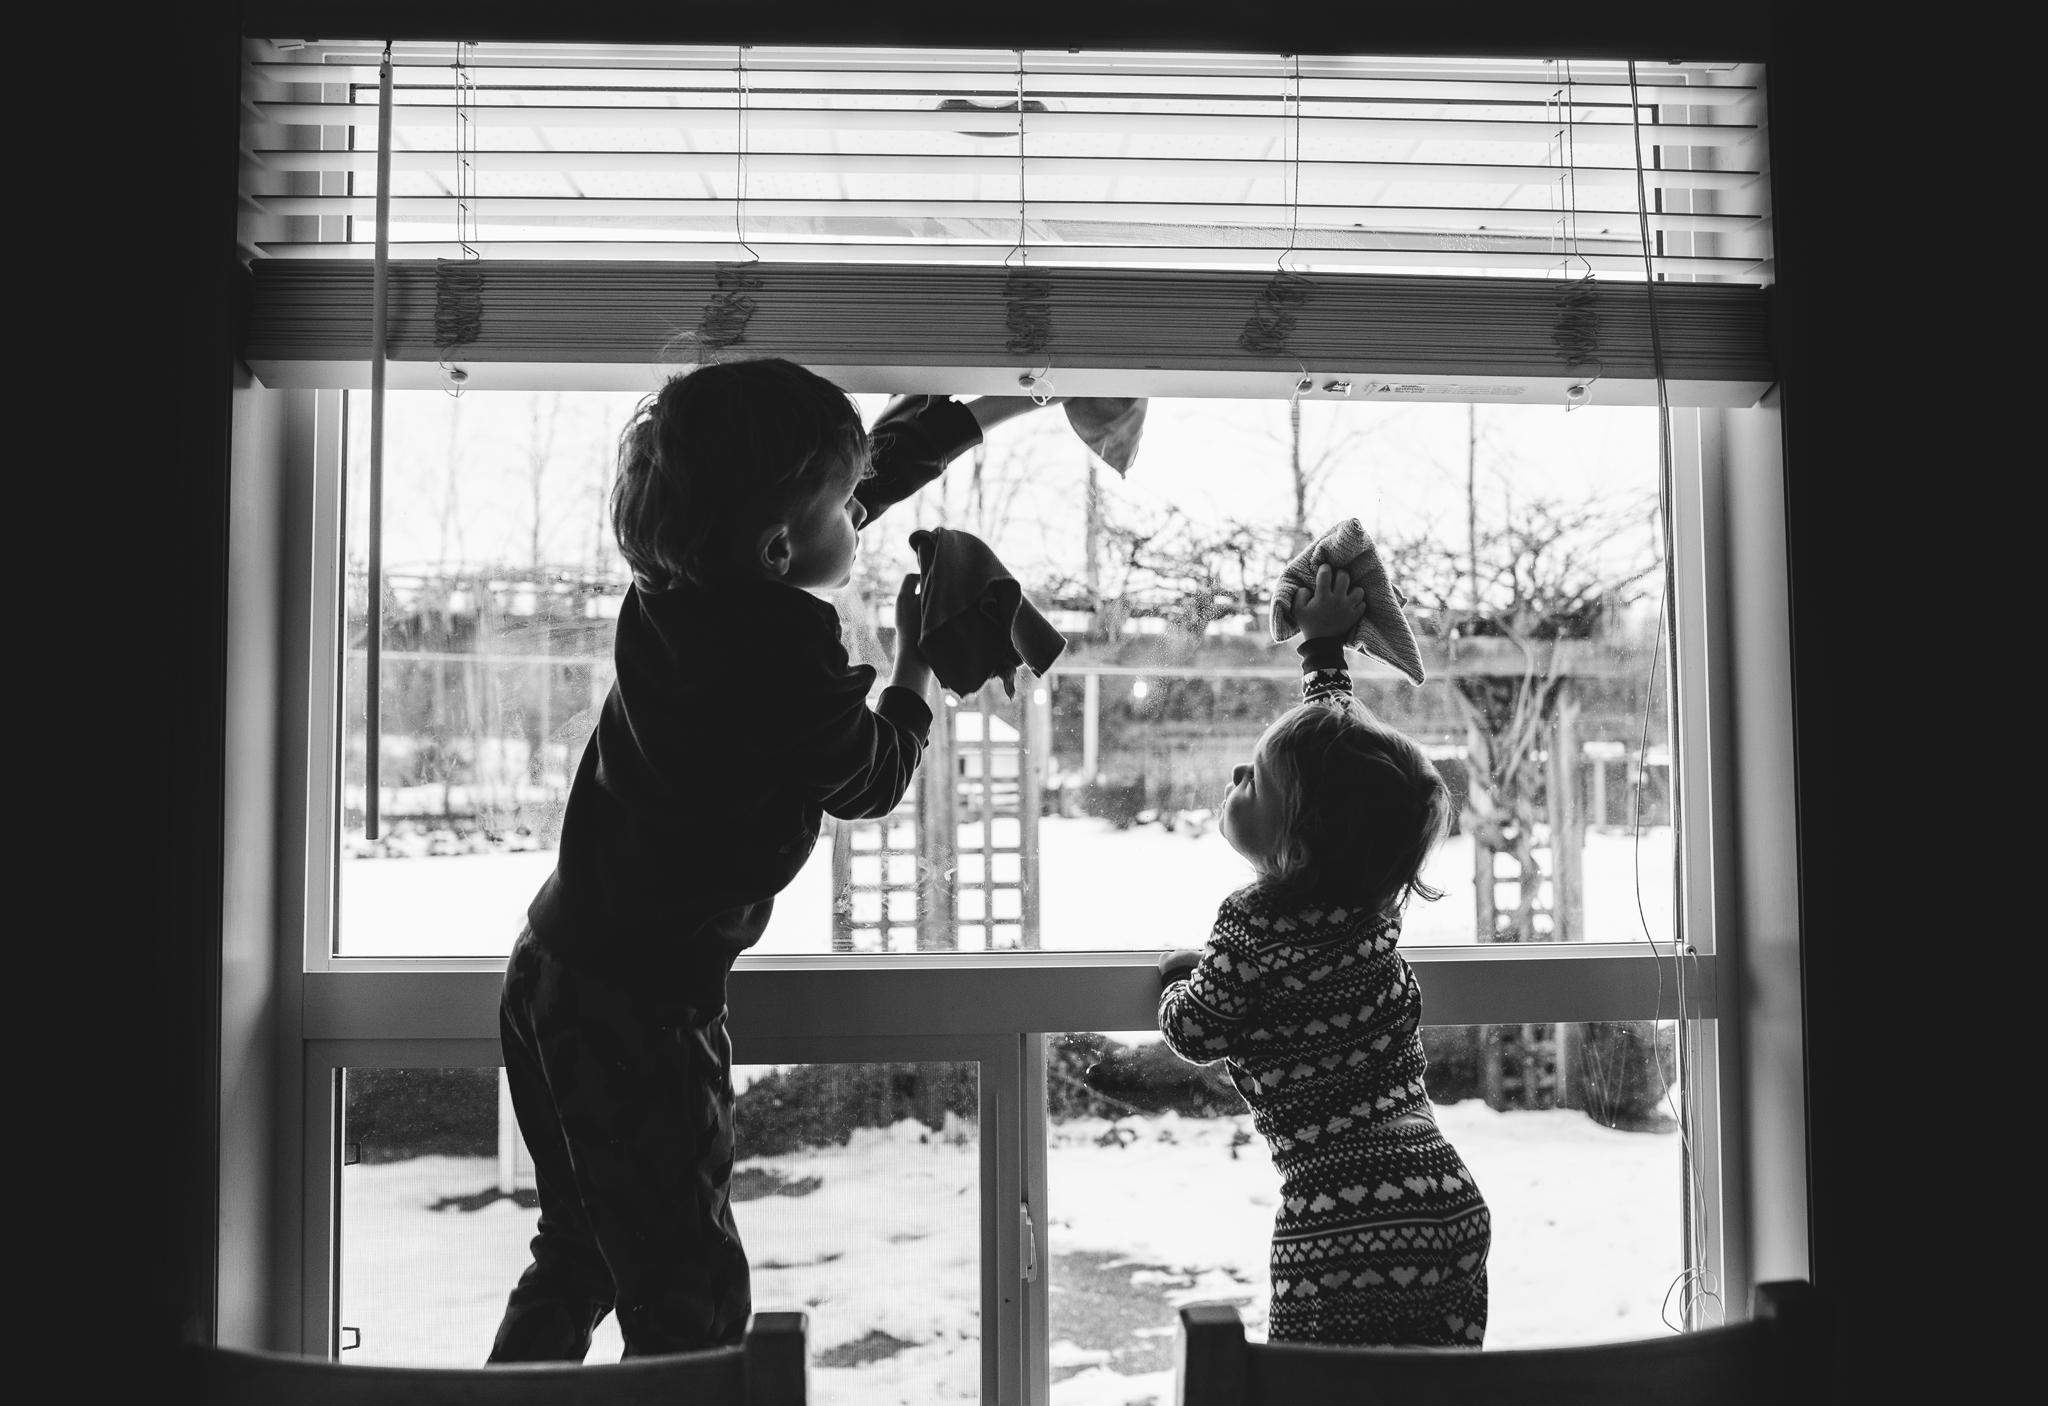 pepper and atti washing windows-1.jpg